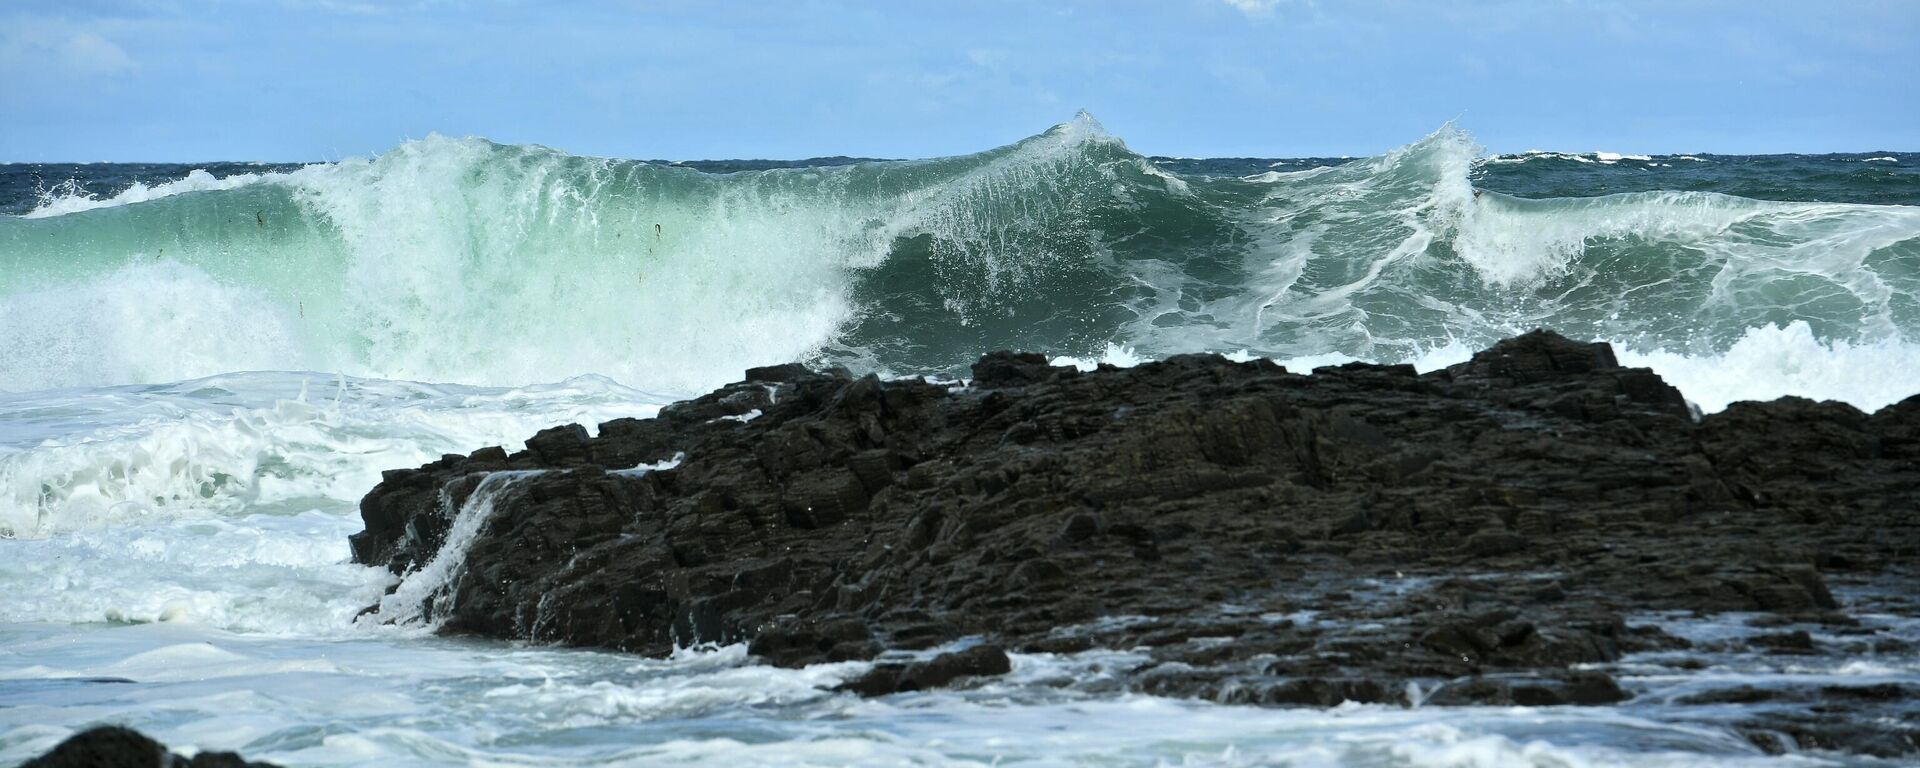 Ozean-Küste  - SNA, 1920, 27.12.2020